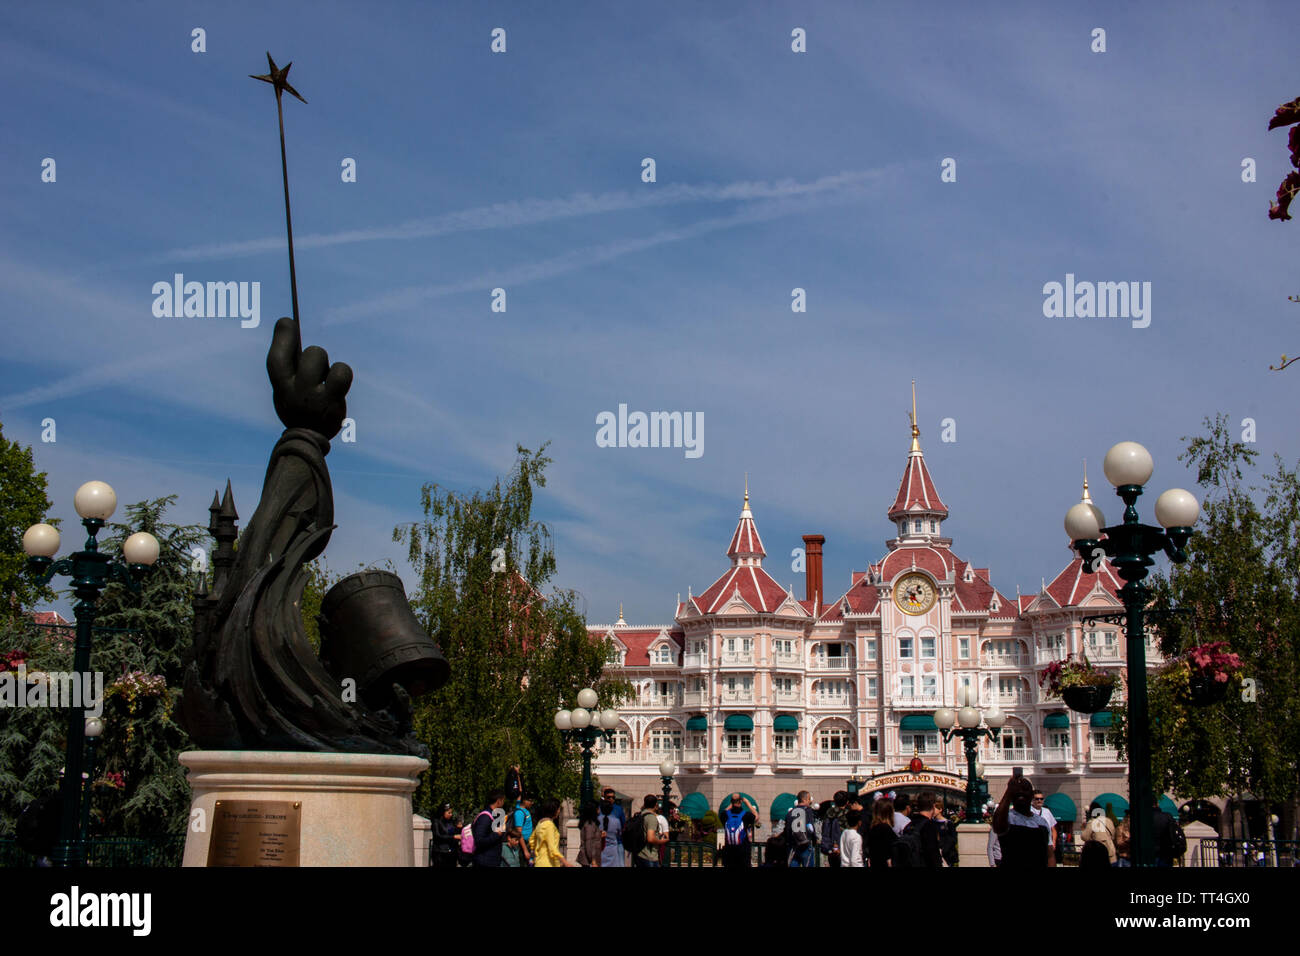 A view of the Disneyland Hotel at Disneyland Paris. Lewis Mitchell Stock Photo